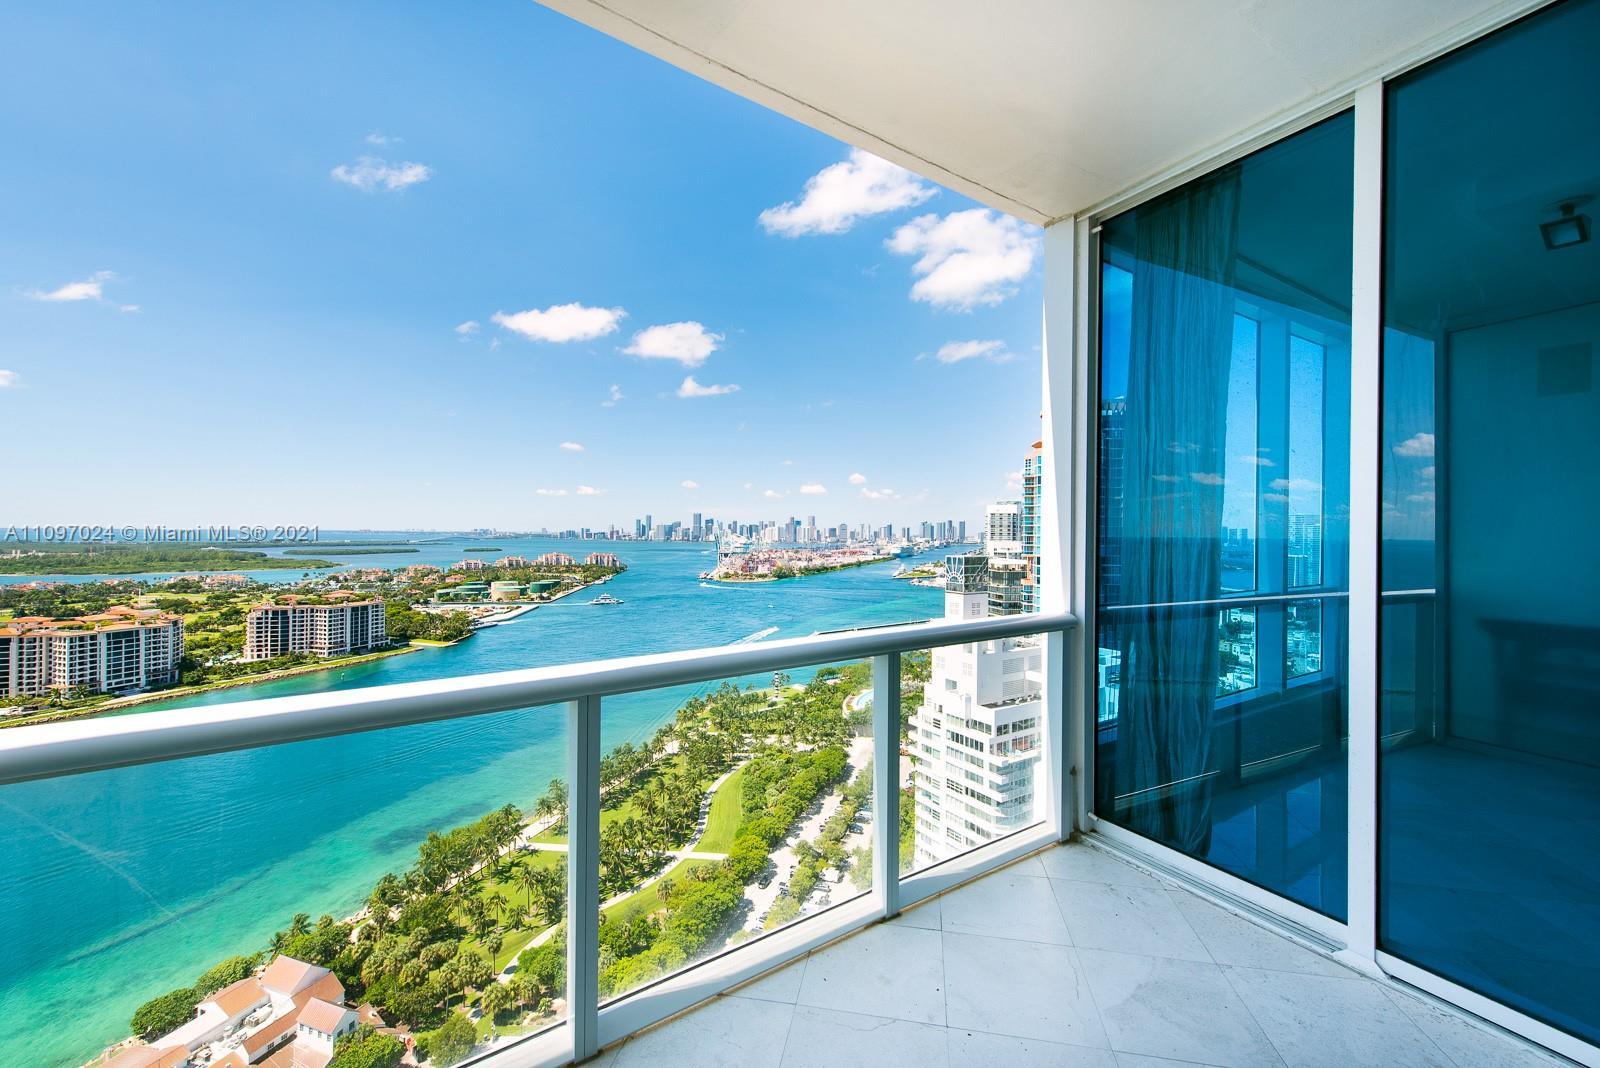 100 Pointe Dr Unit 3102, Miami Beach, Florida 33139